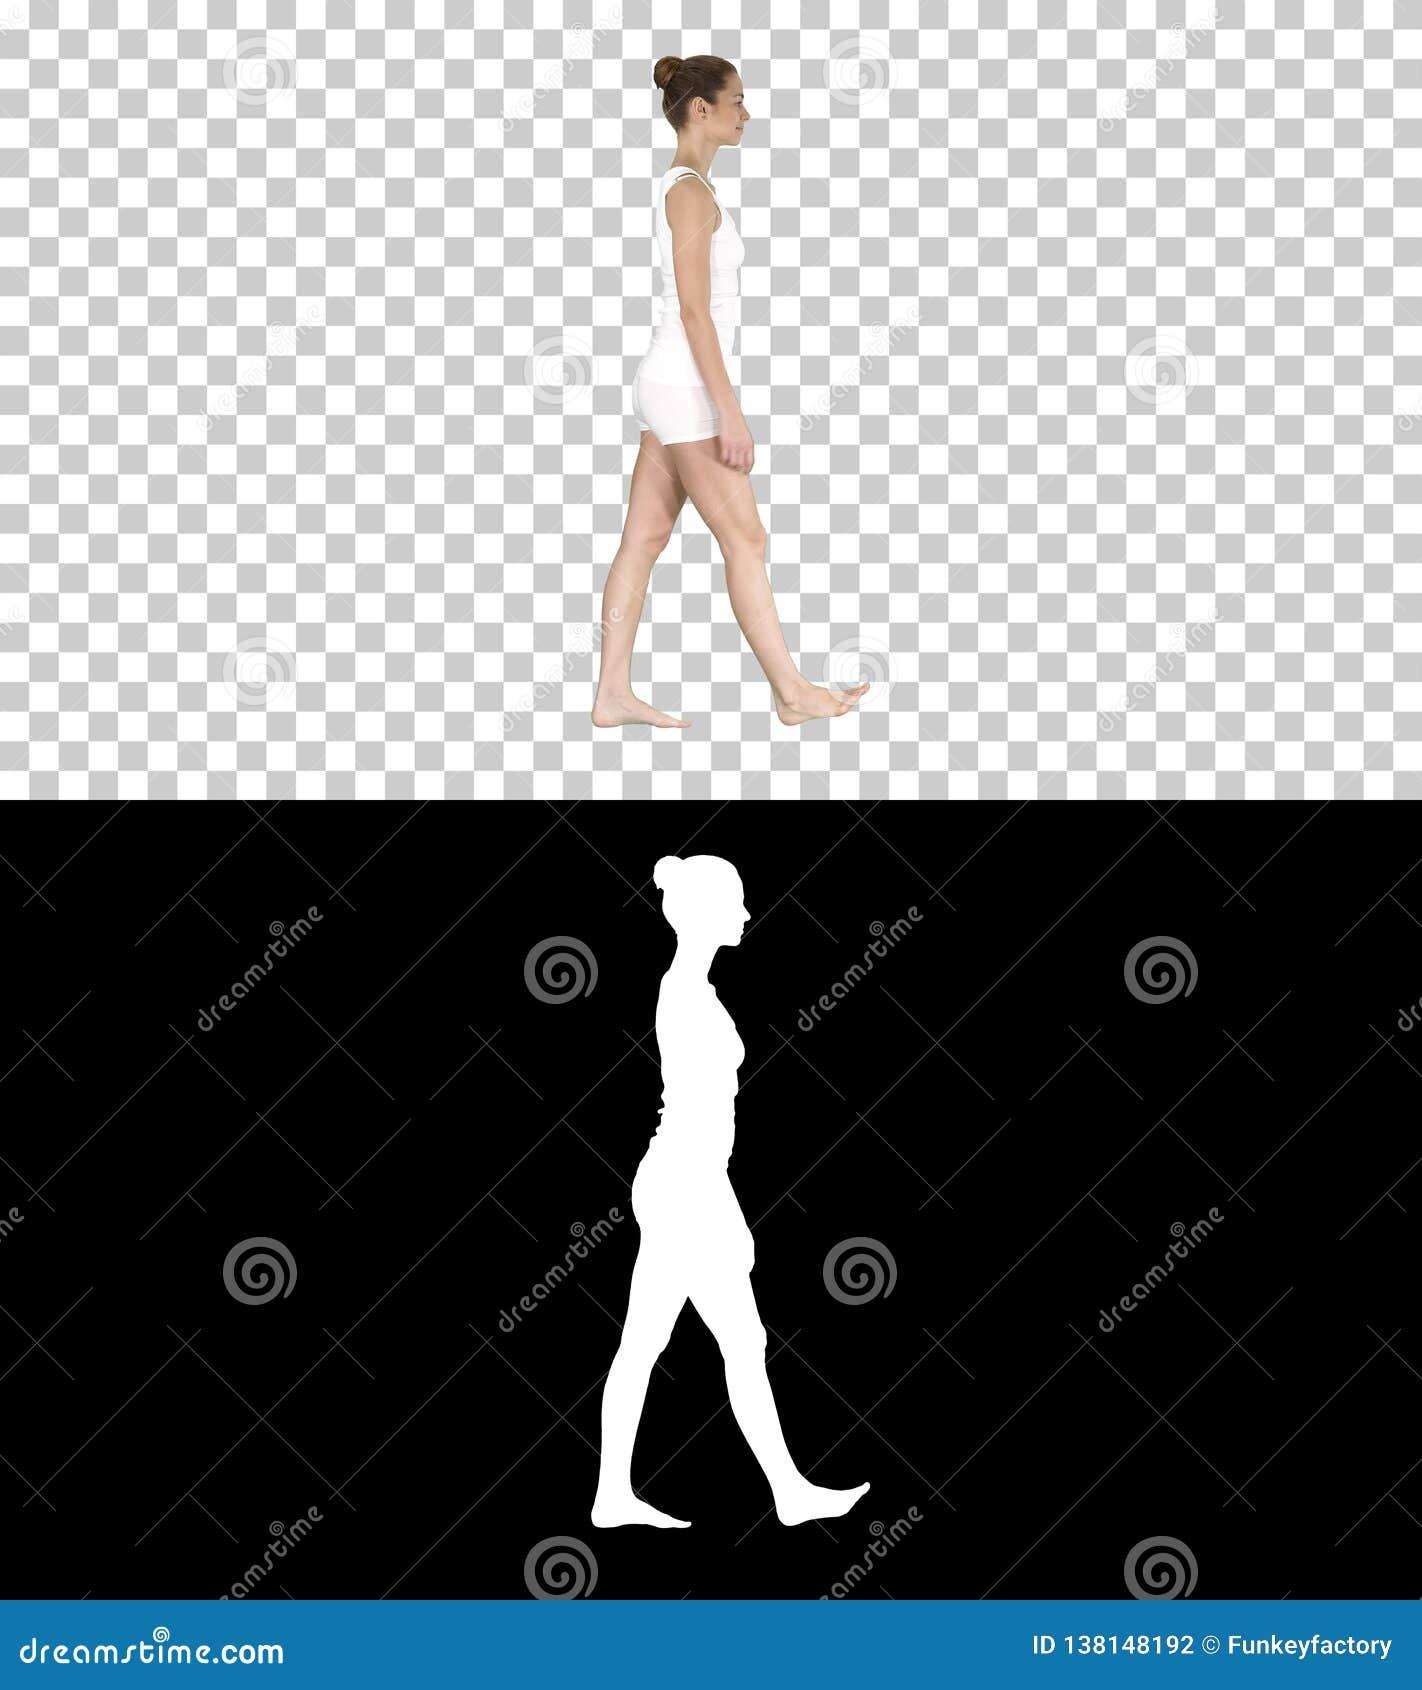 Una femmina che cammina a piedi nudi in vestiti bianchi, Alpha Channel